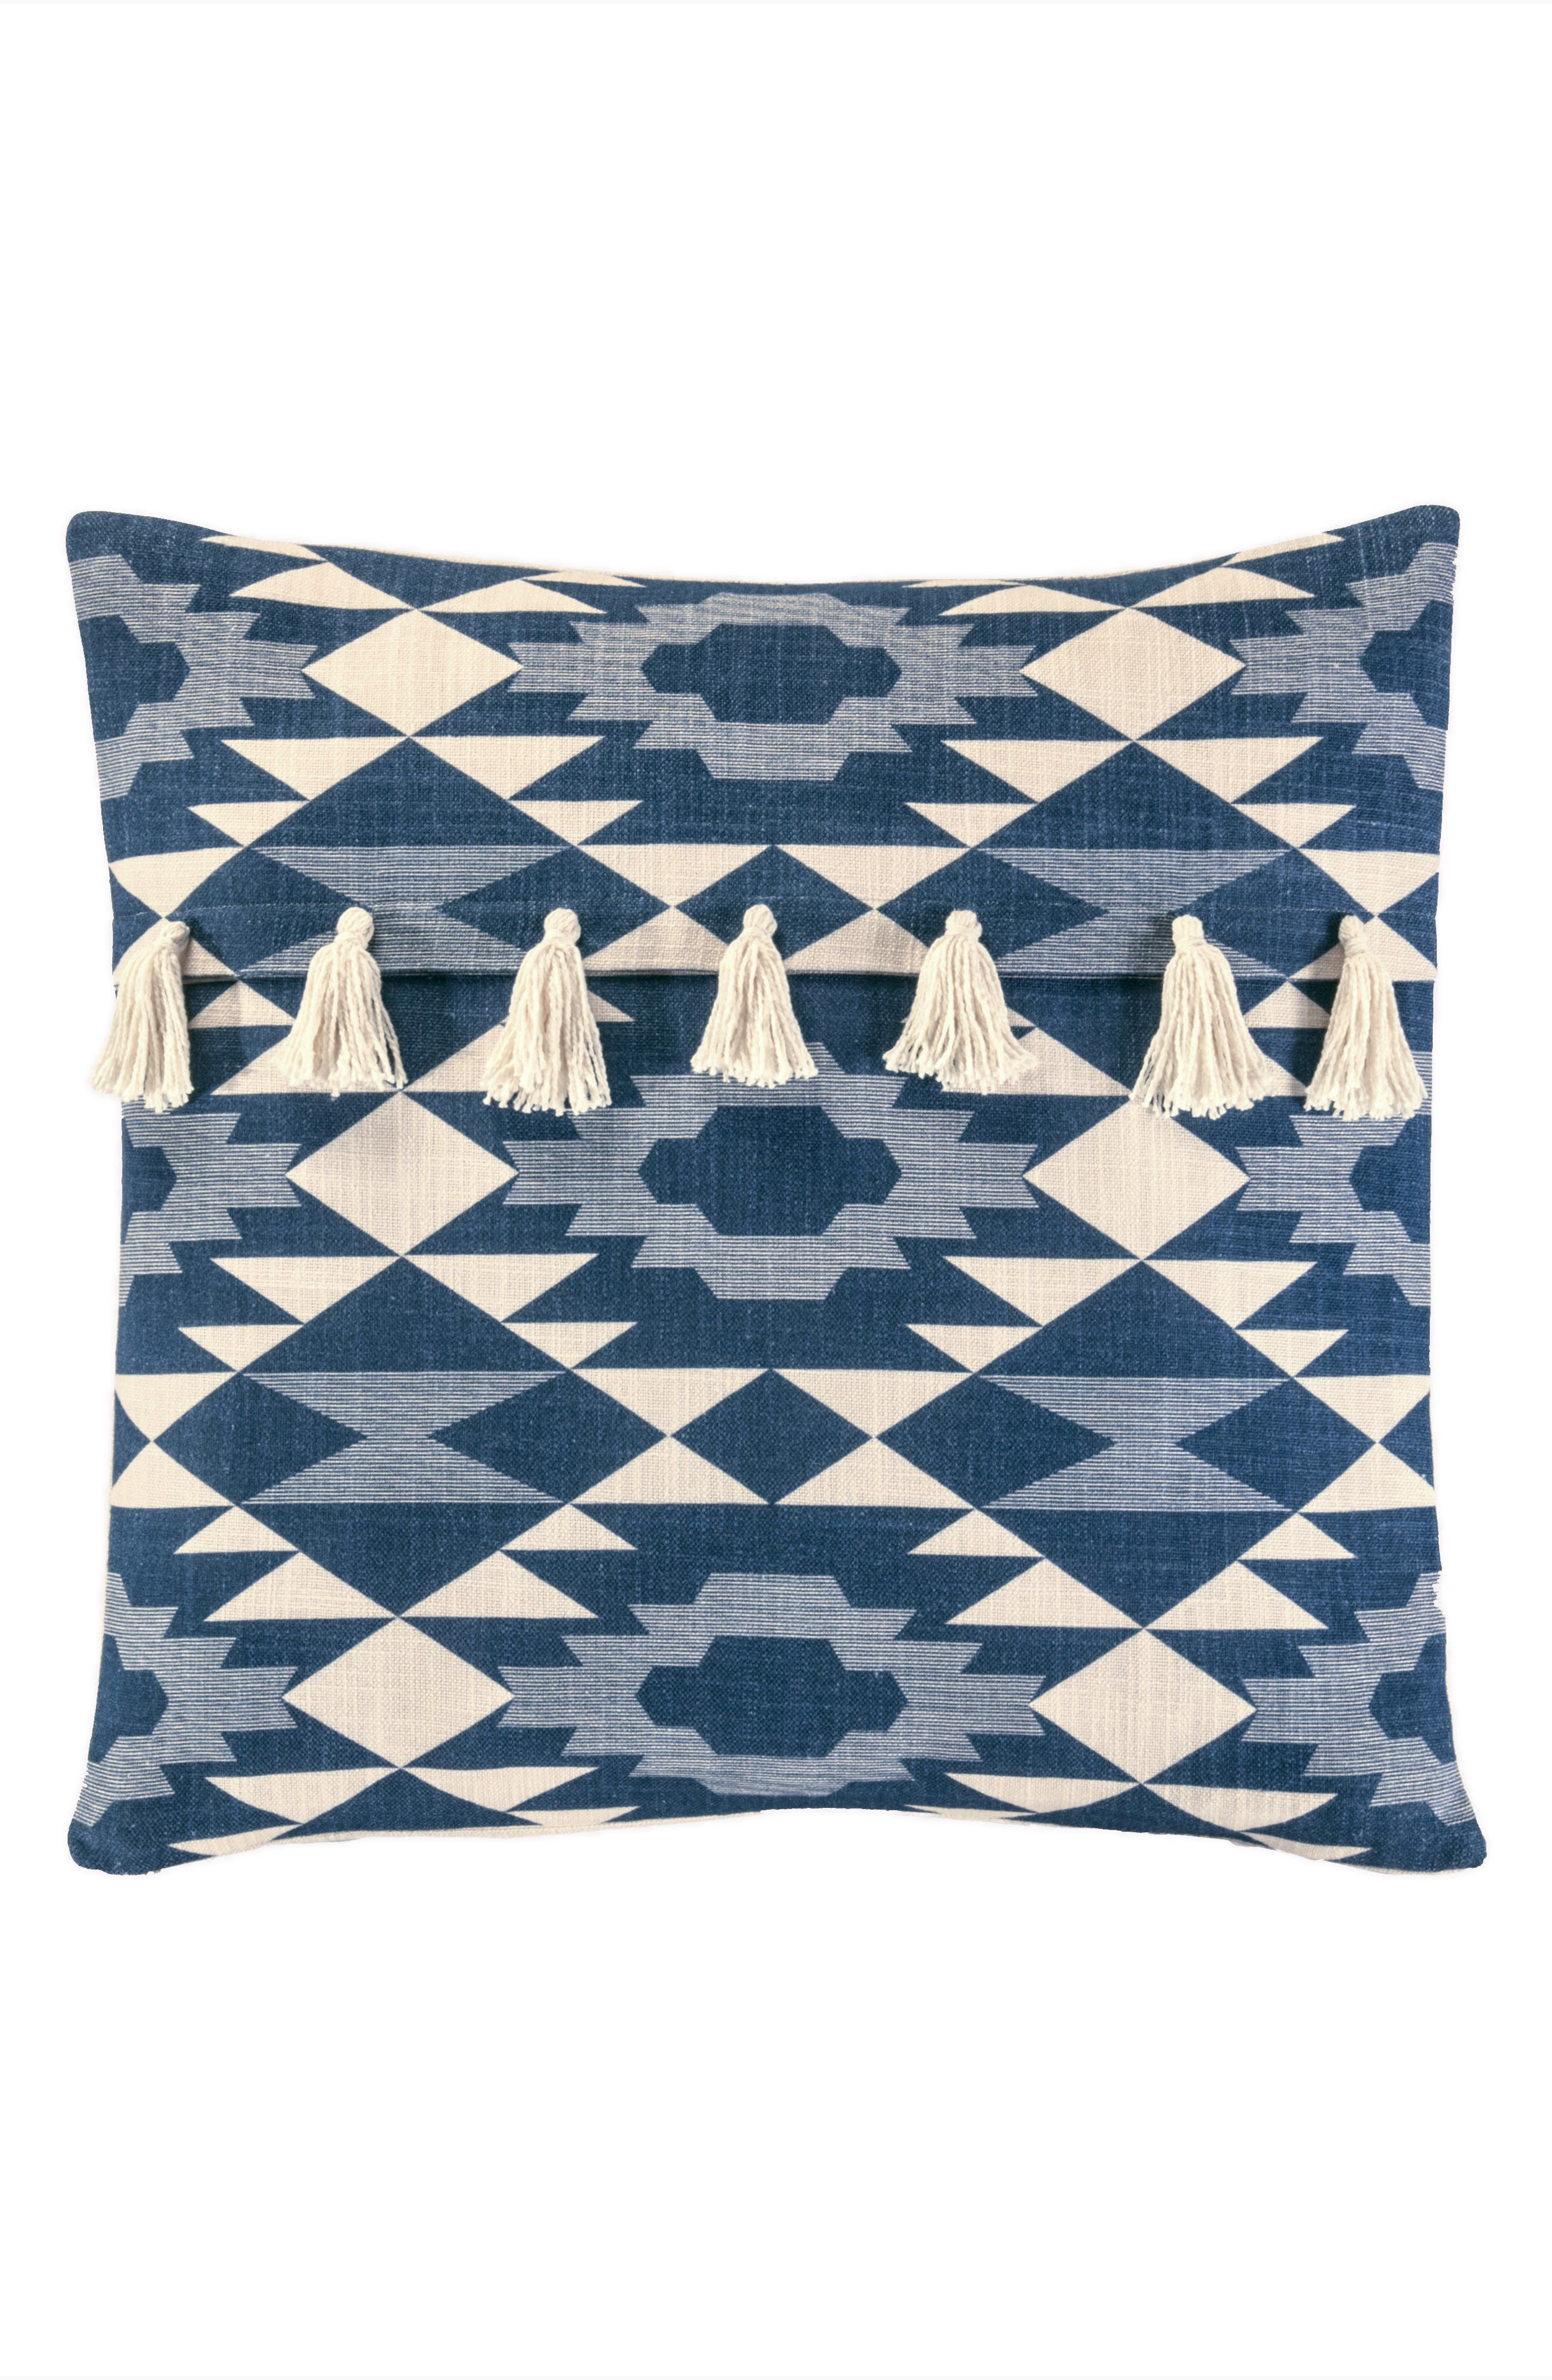 Yuma Star Printed Tassel Accent Pillow,                             Main thumbnail 1, color,                             BLUE